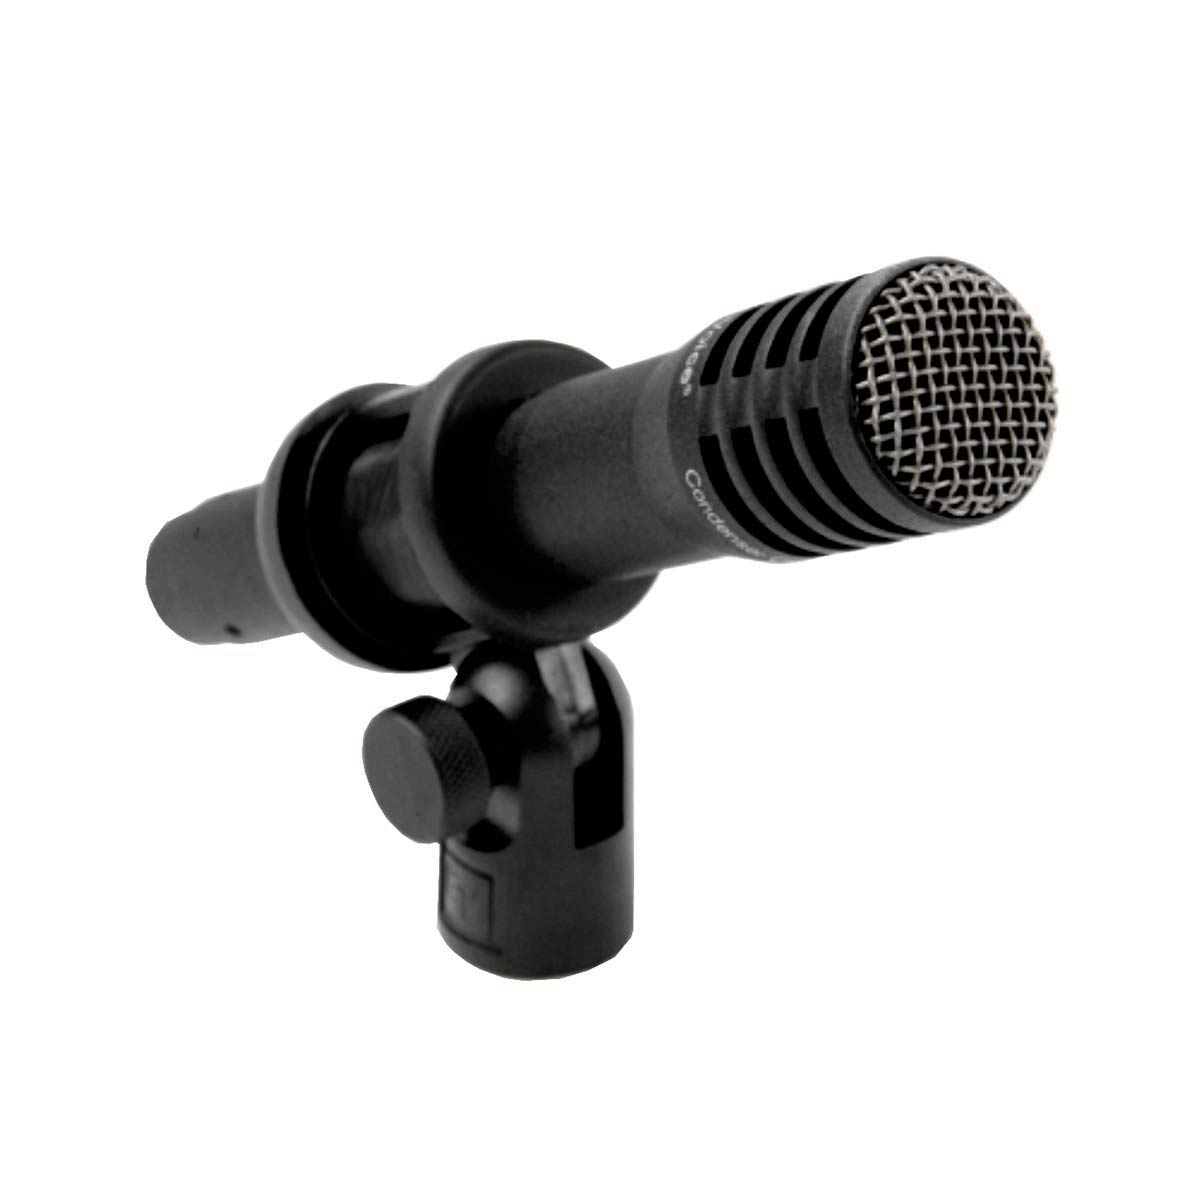 Microfone c/ Fio p/ Pratos e Intrumentos PL 37 - Electro-Voice